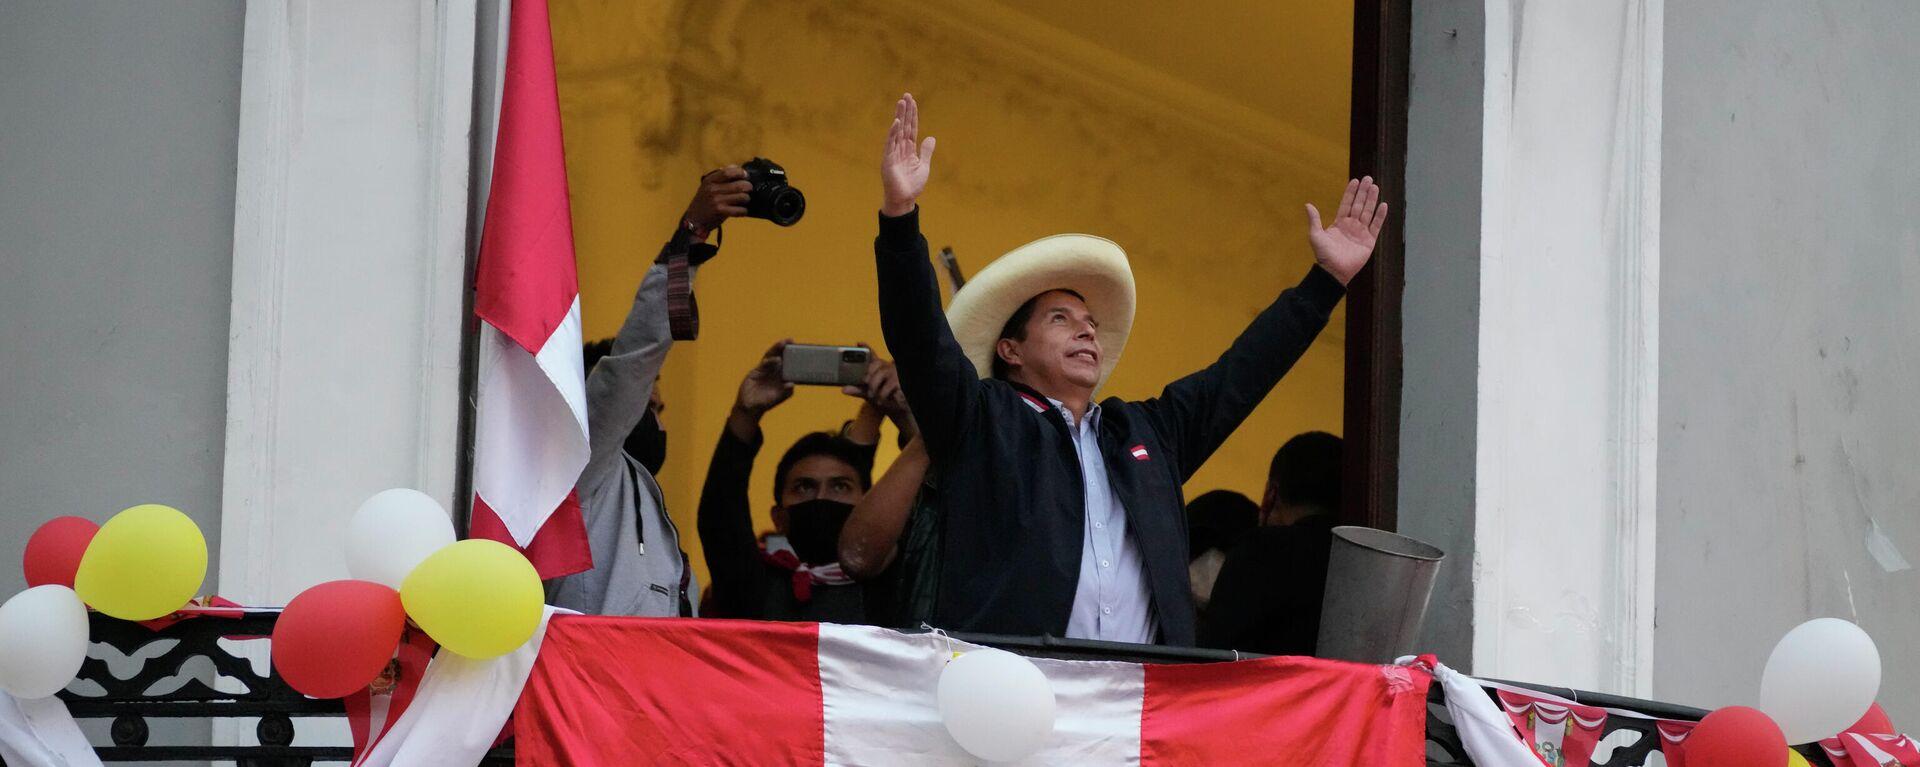 Pedro Castillo, candidato a la presidencia de Perú - Sputnik Mundo, 1920, 23.07.2021